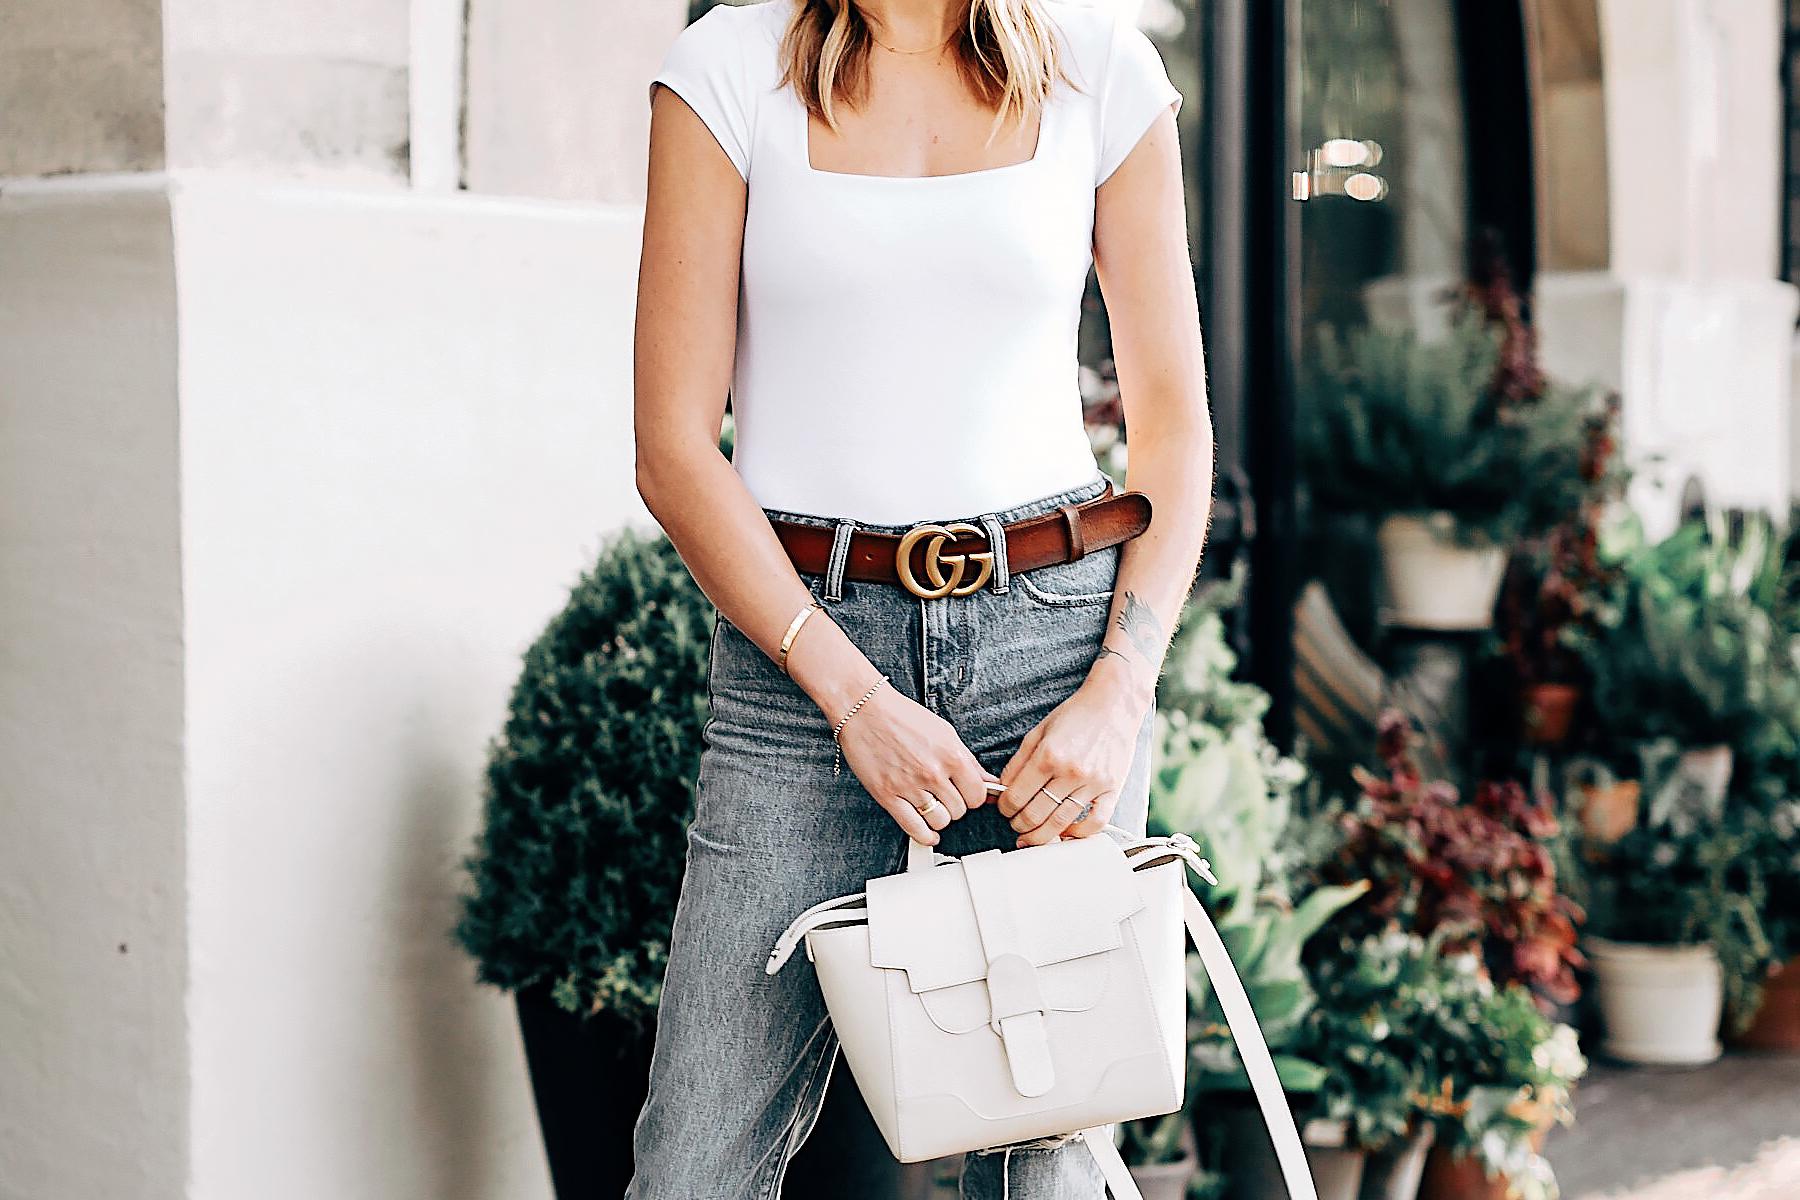 Woman Wearing Senreve Mini Maestra Cream Free People White Bodysuit Ripped Jeans Gucci Brown Leather Double G Belt Fashion Jackson San Diego Fashion Blogger Street Style